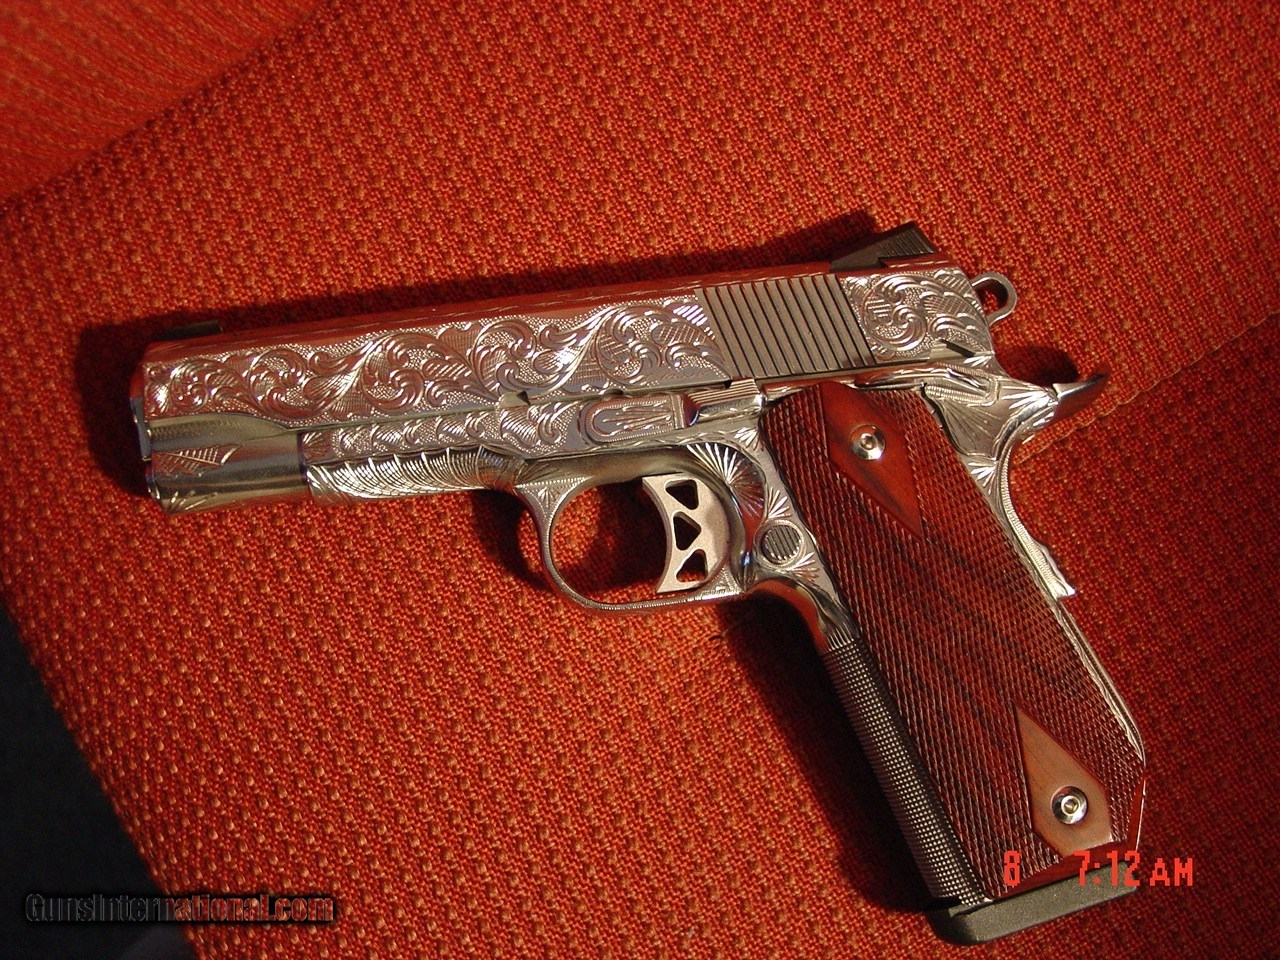 Dan Wesson 1911 Commander Bobtail 45acp,fully engraved